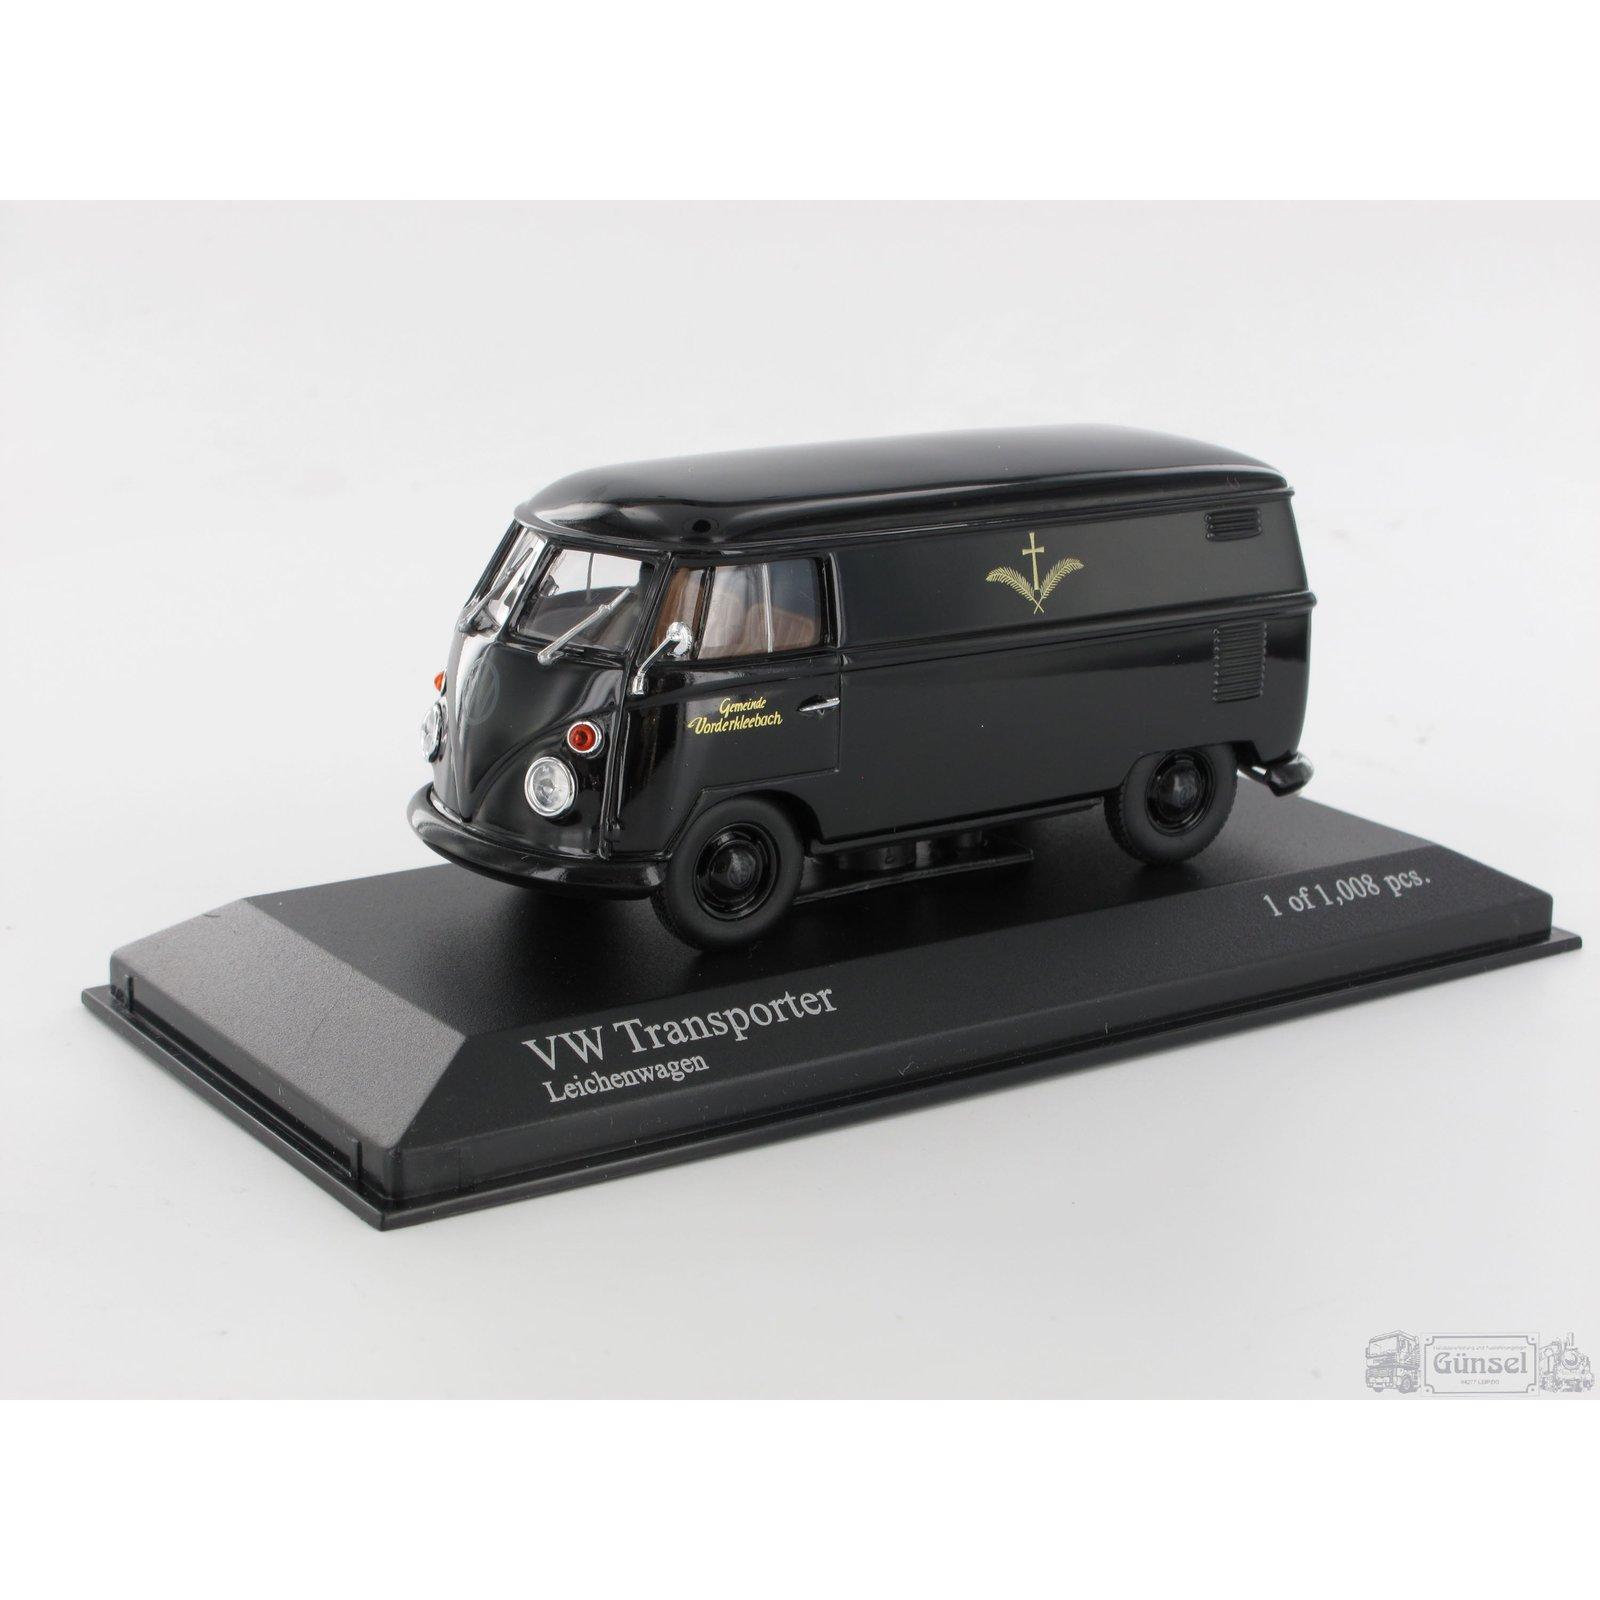 minichamps 430052211vw t1 leichenwagen 1963 massstab 1 43. Black Bedroom Furniture Sets. Home Design Ideas